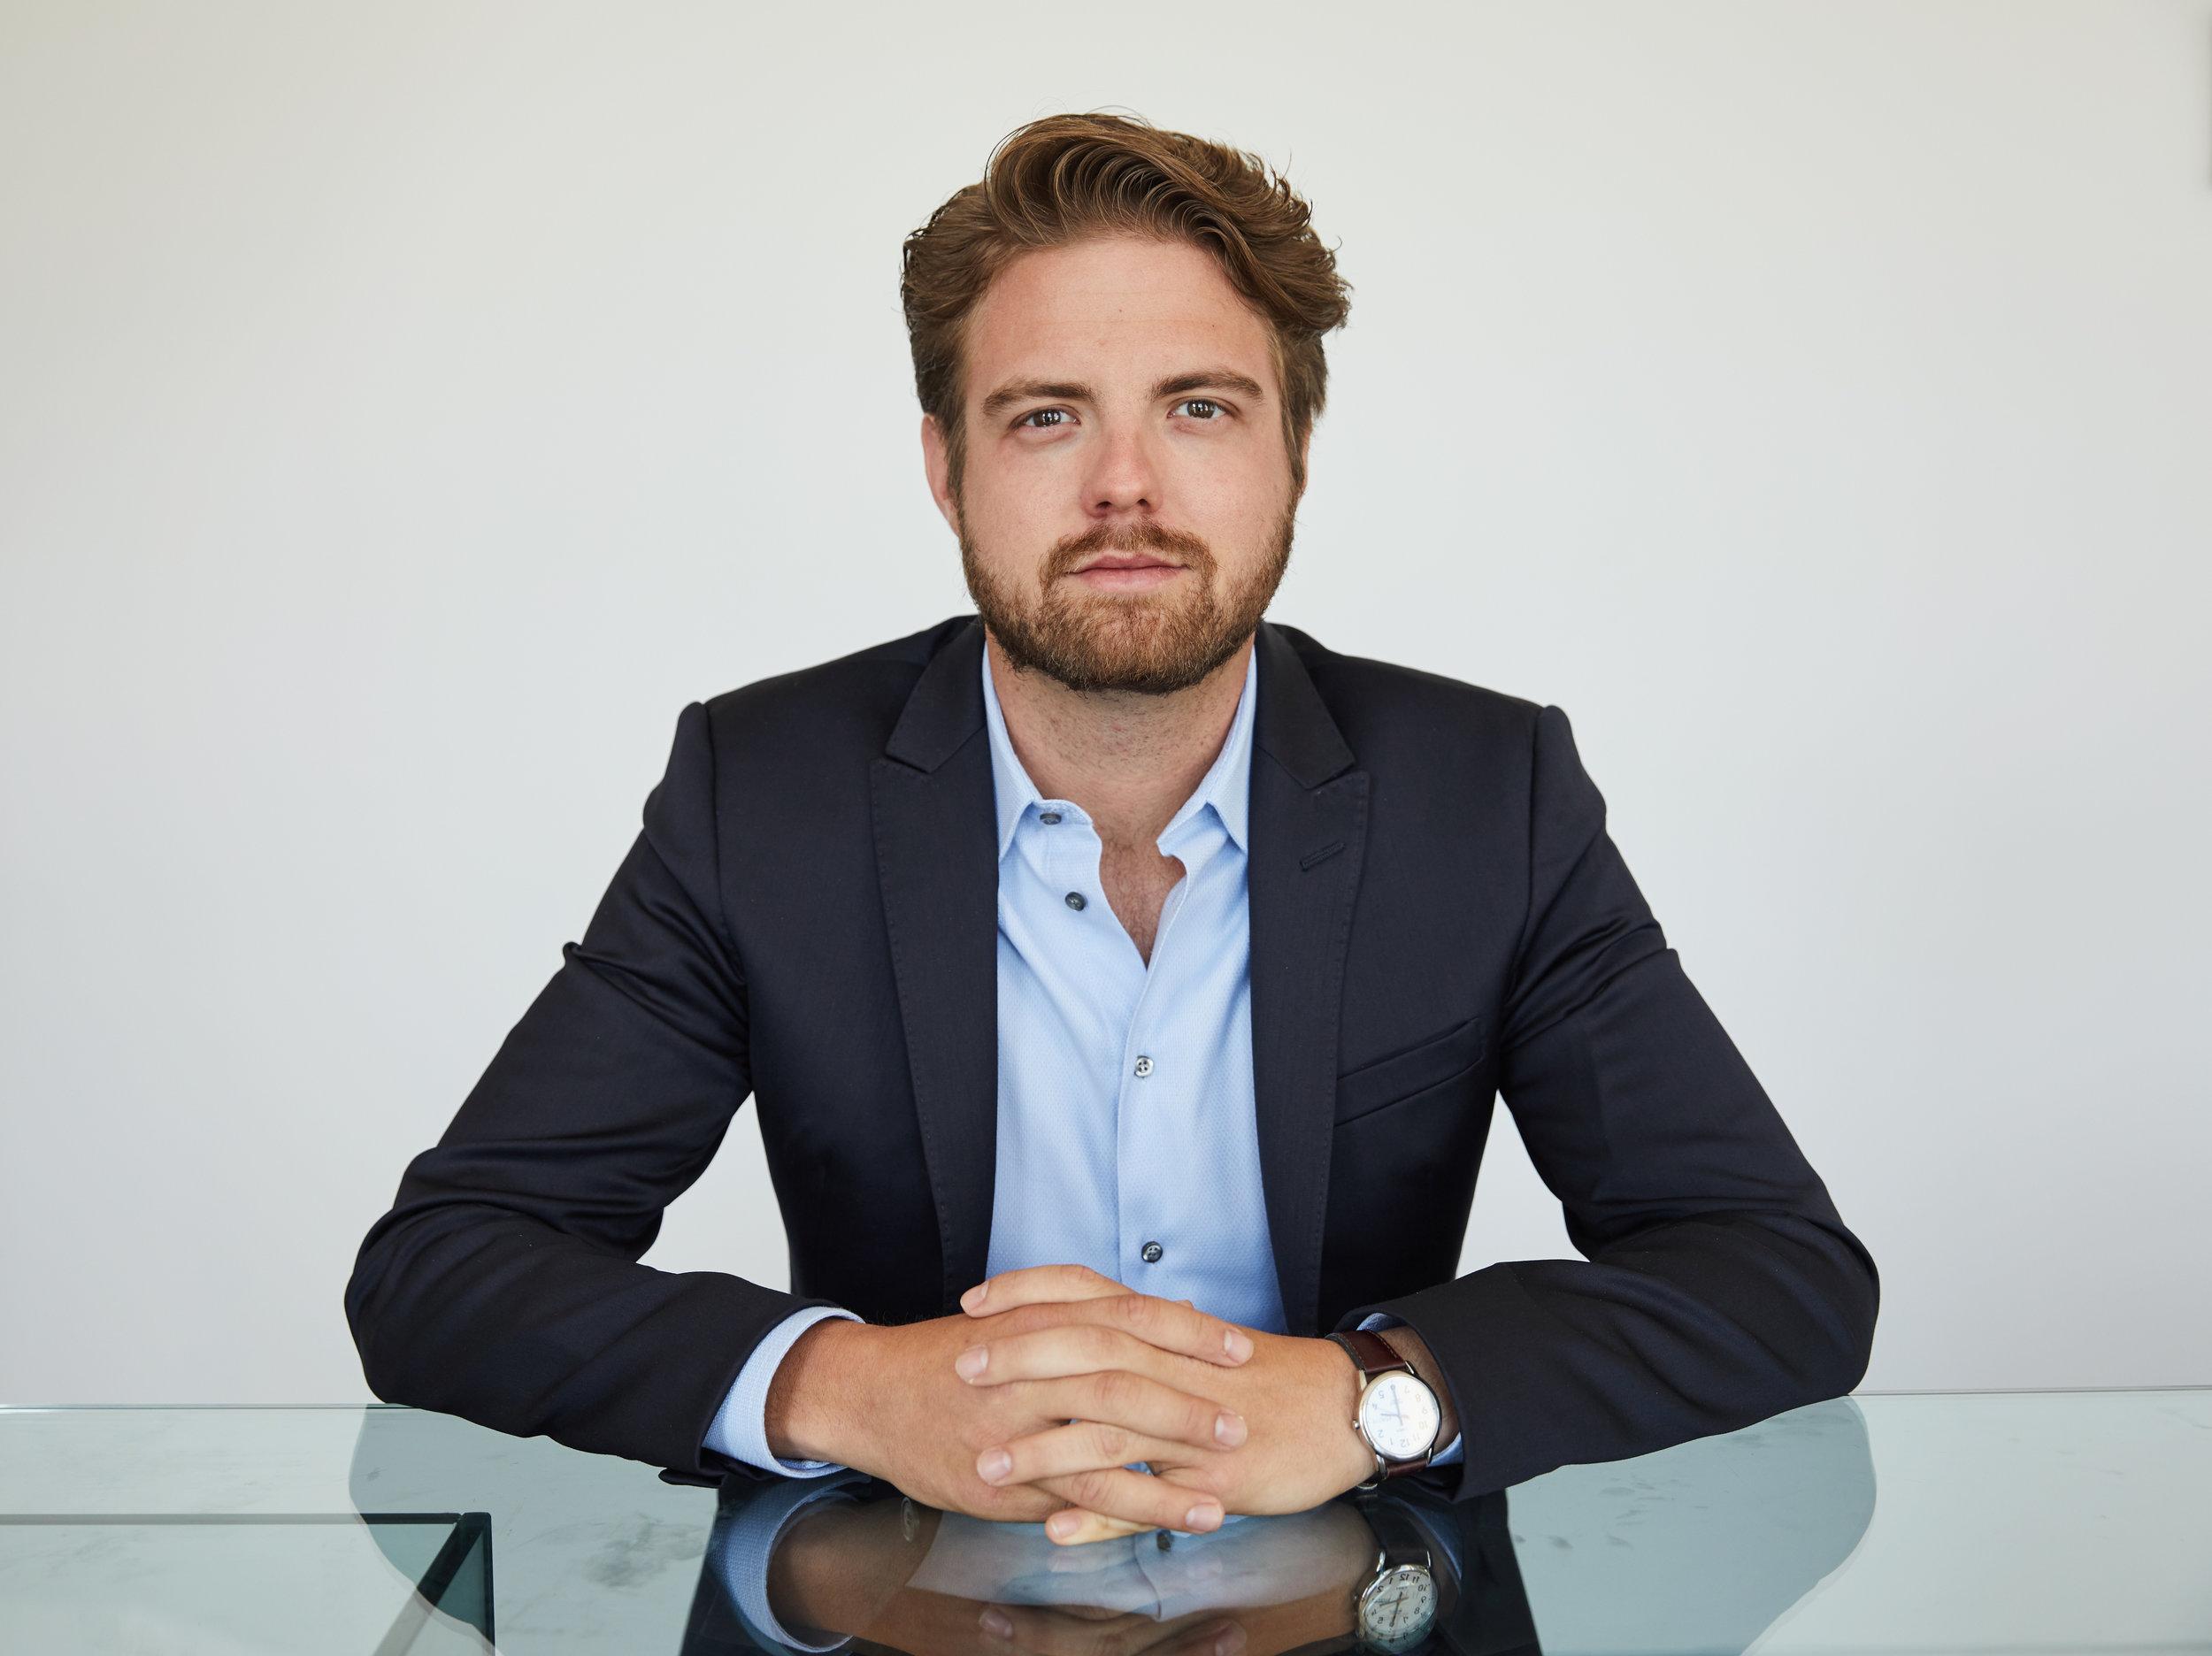 Peter Smith - Founder, Blockchain